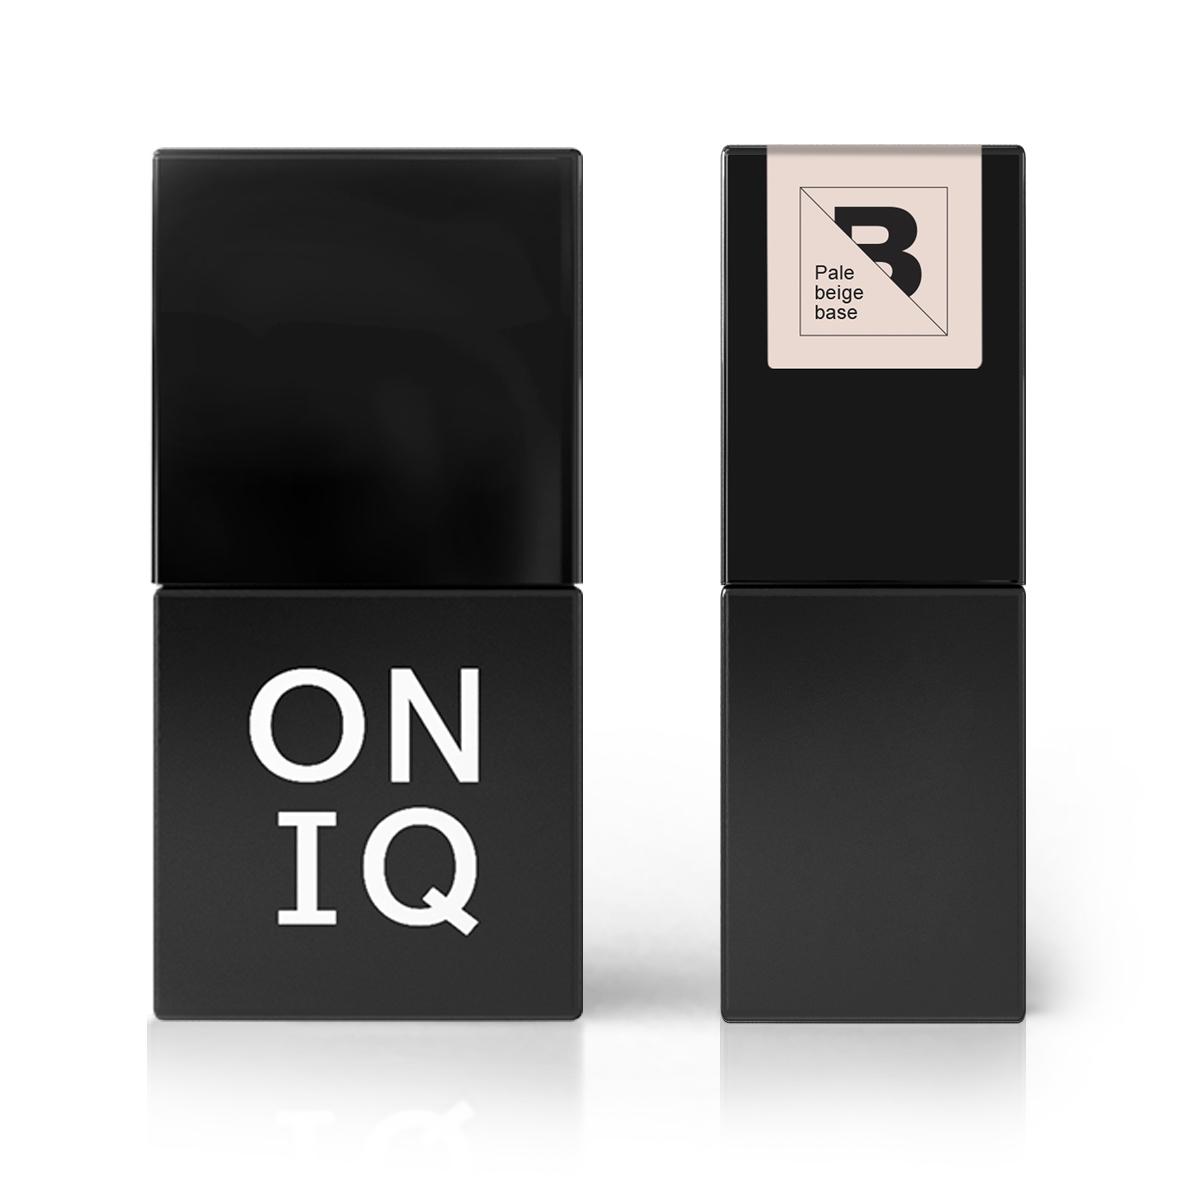 Купить ONIQ Покрытие базовое, бледно-бежевое / Pale beige base 10 мл